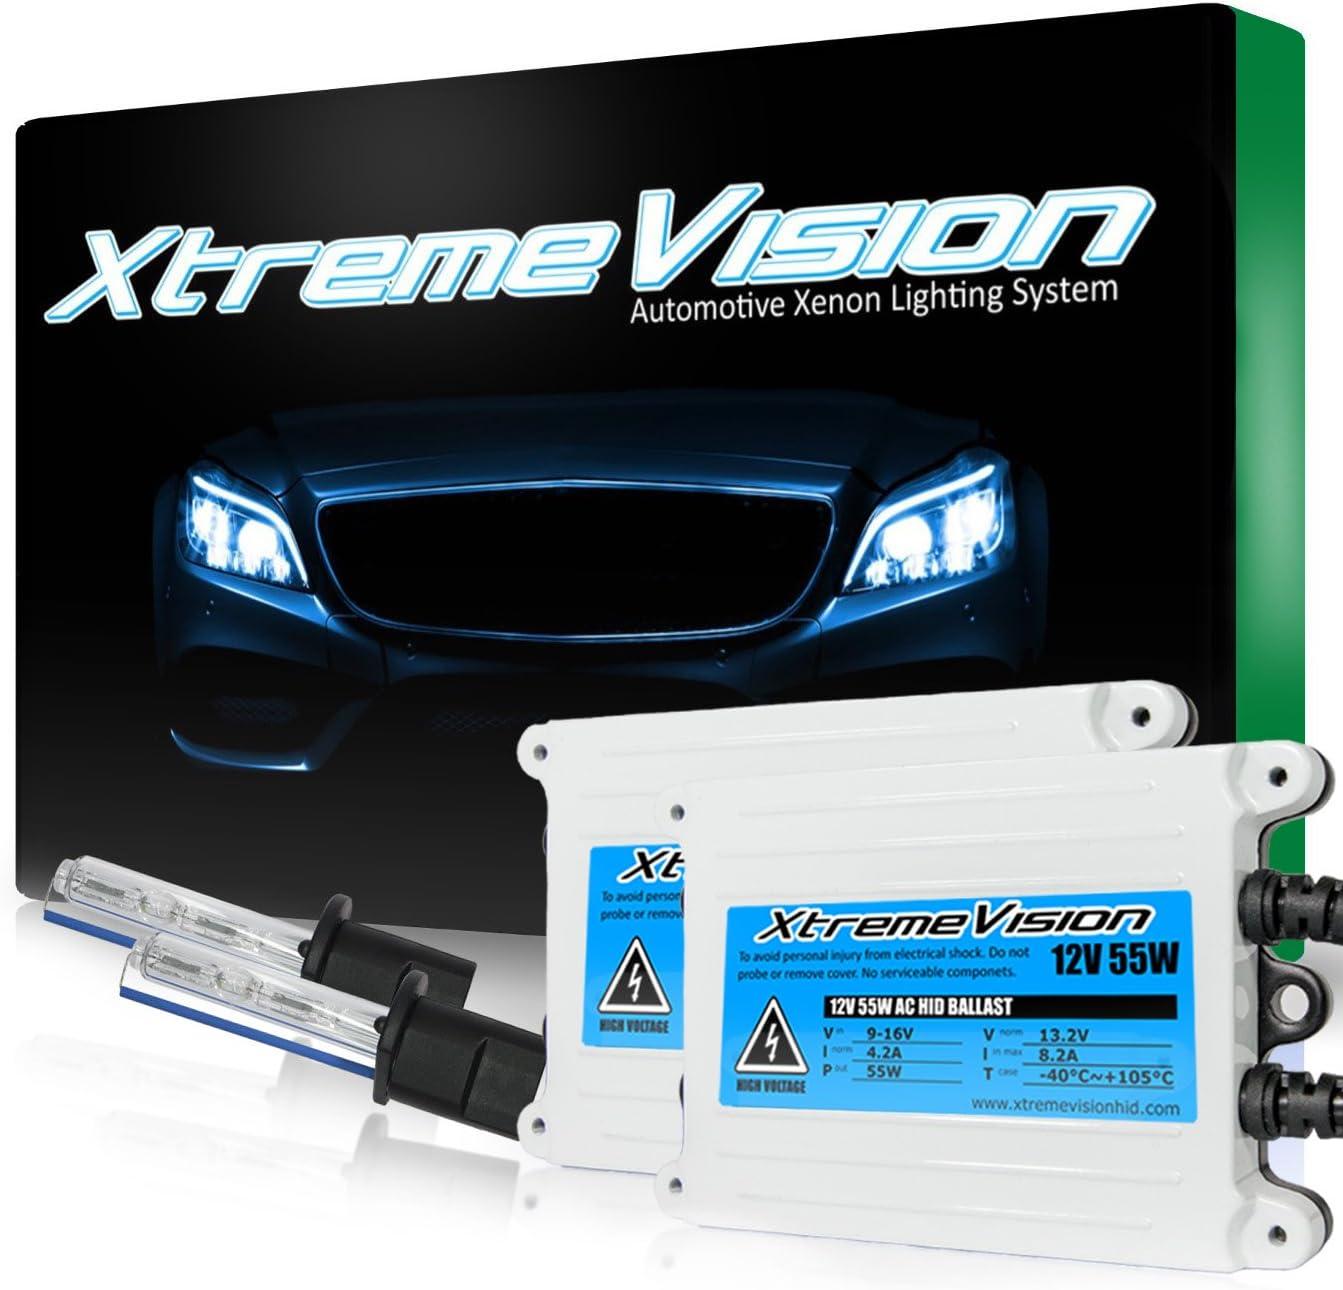 XtremeVision 55W AC Xenon HID Bundle kits